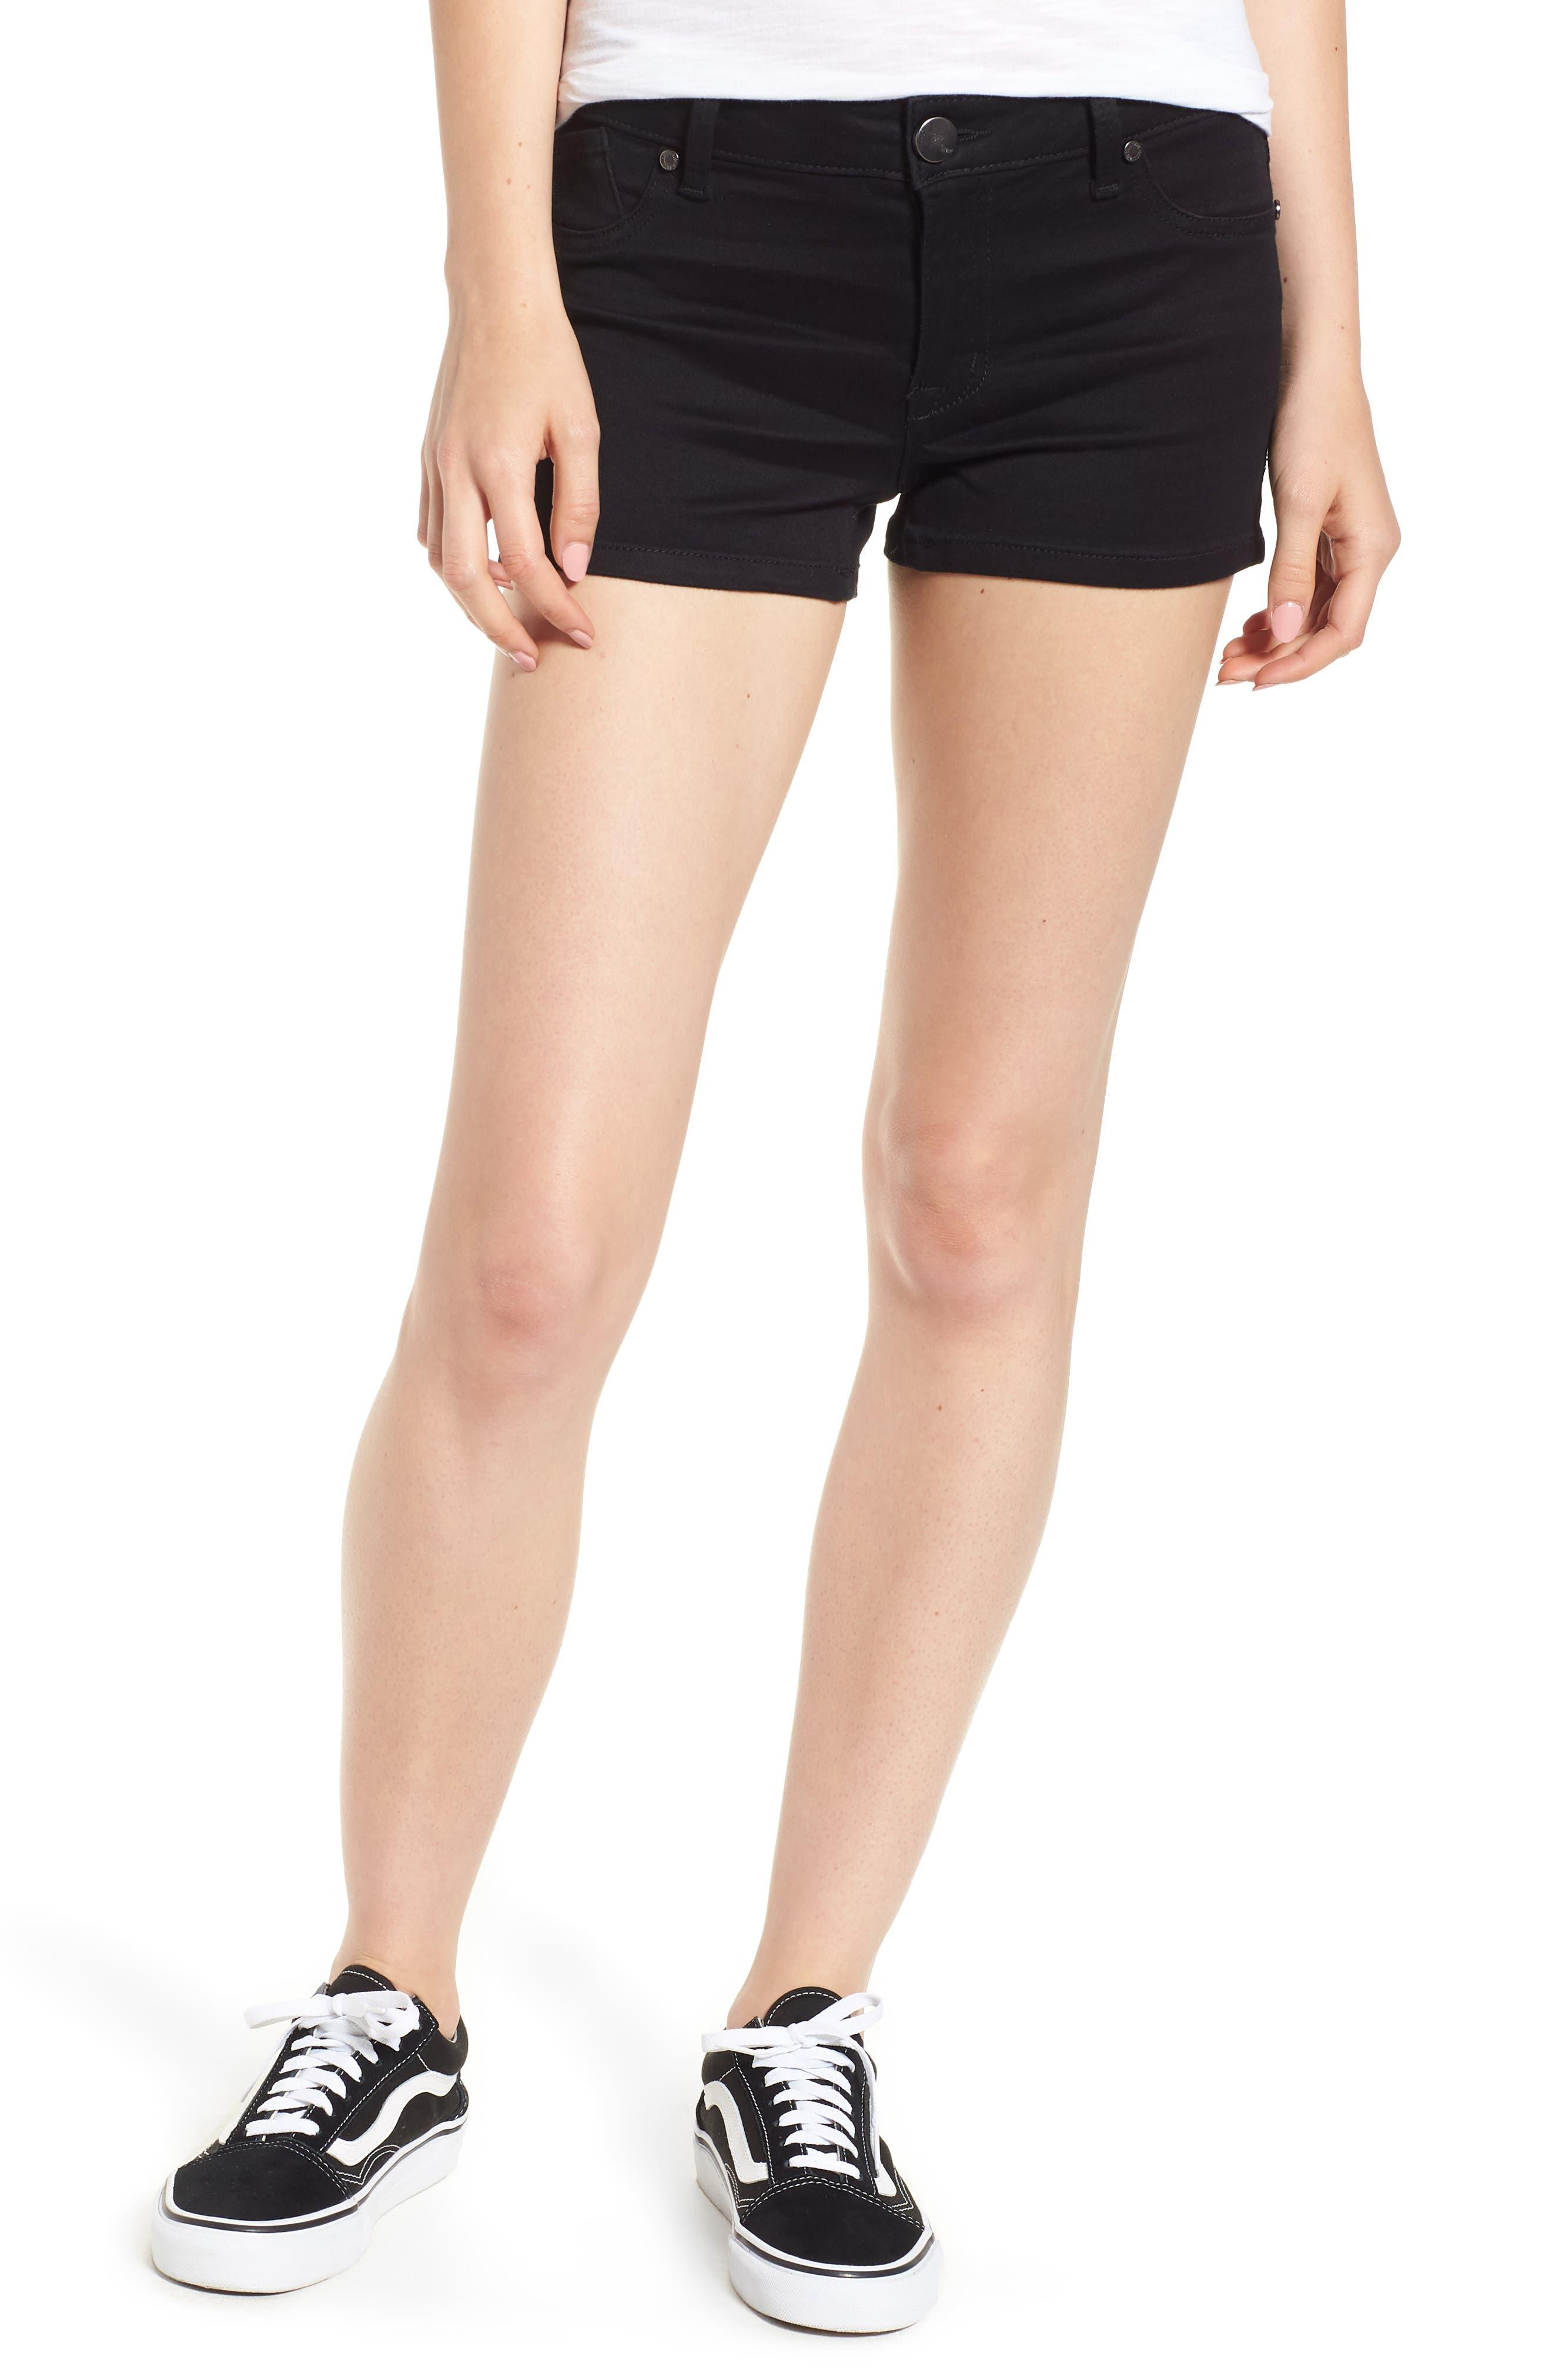 Butter Denim Shorts,                             Main thumbnail 1, color,                             001